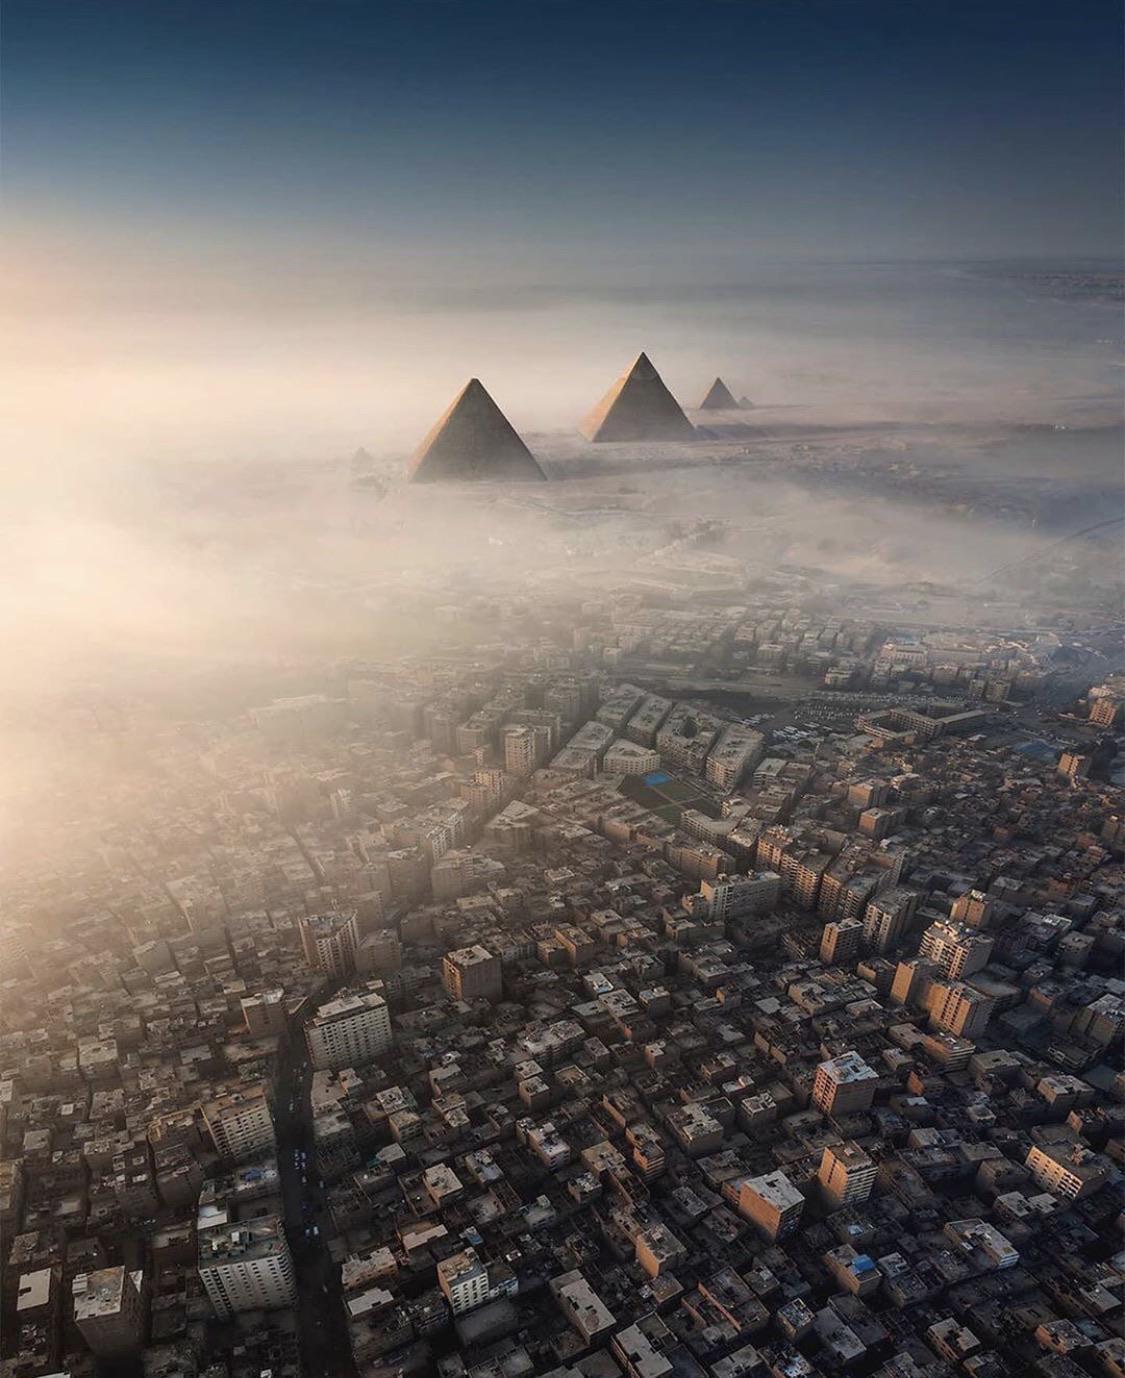 Pyramids by drone